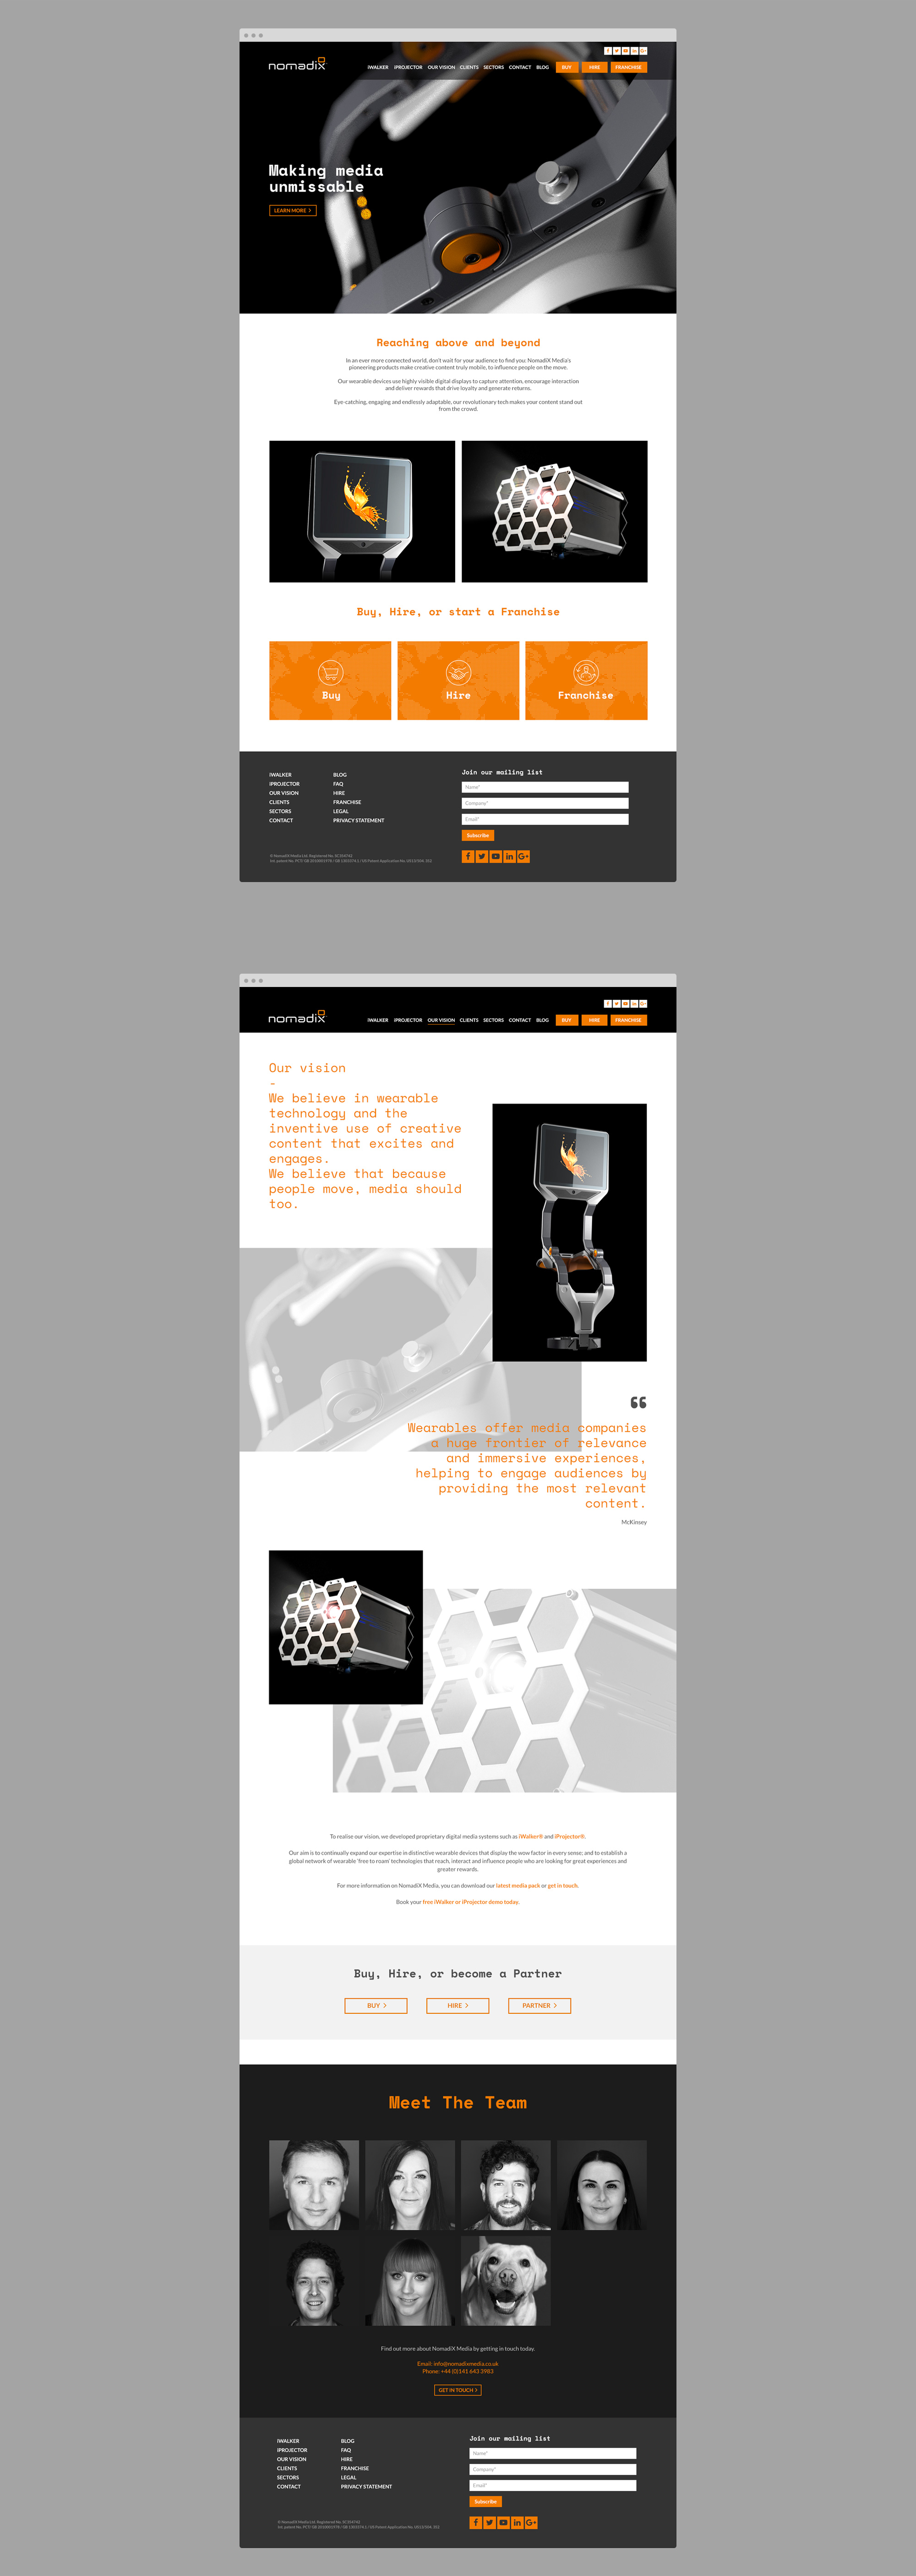 web-mocks-home-vision.jpg